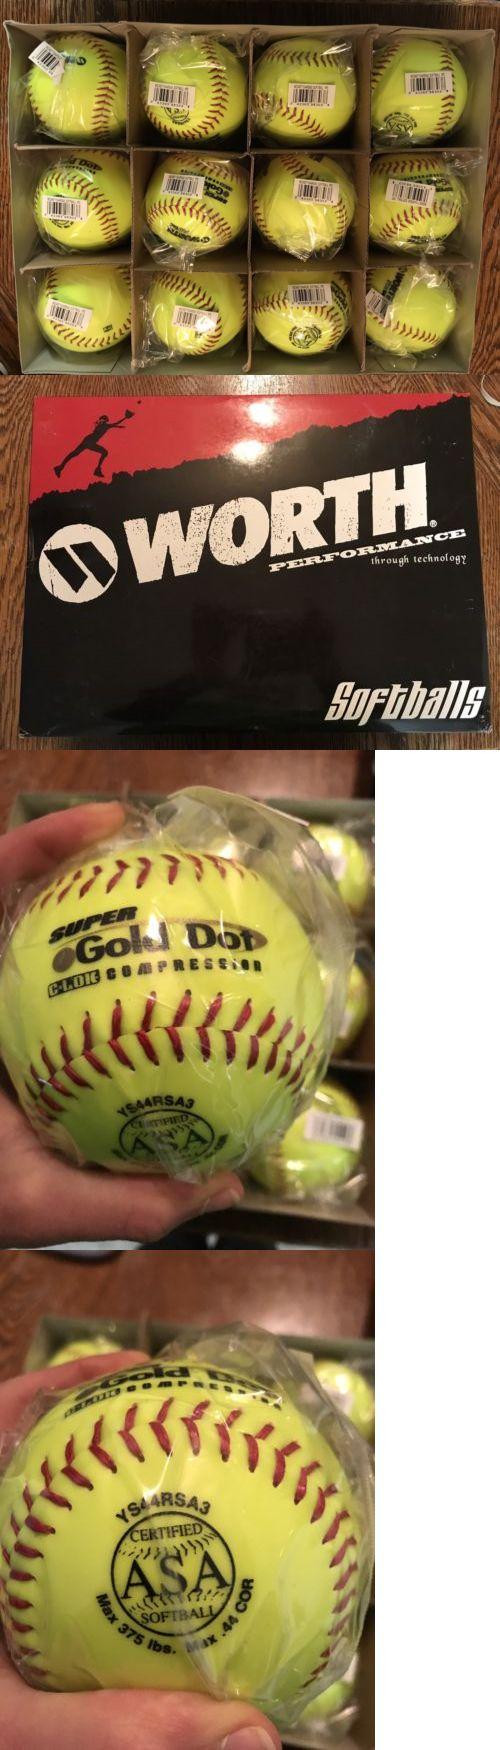 Softballs 16064: New Worth 12 Asa Super Gold Dot Compression Slowpitch Softball Red Stitch 12 Cs -> BUY IT NOW ONLY: $46 on eBay!